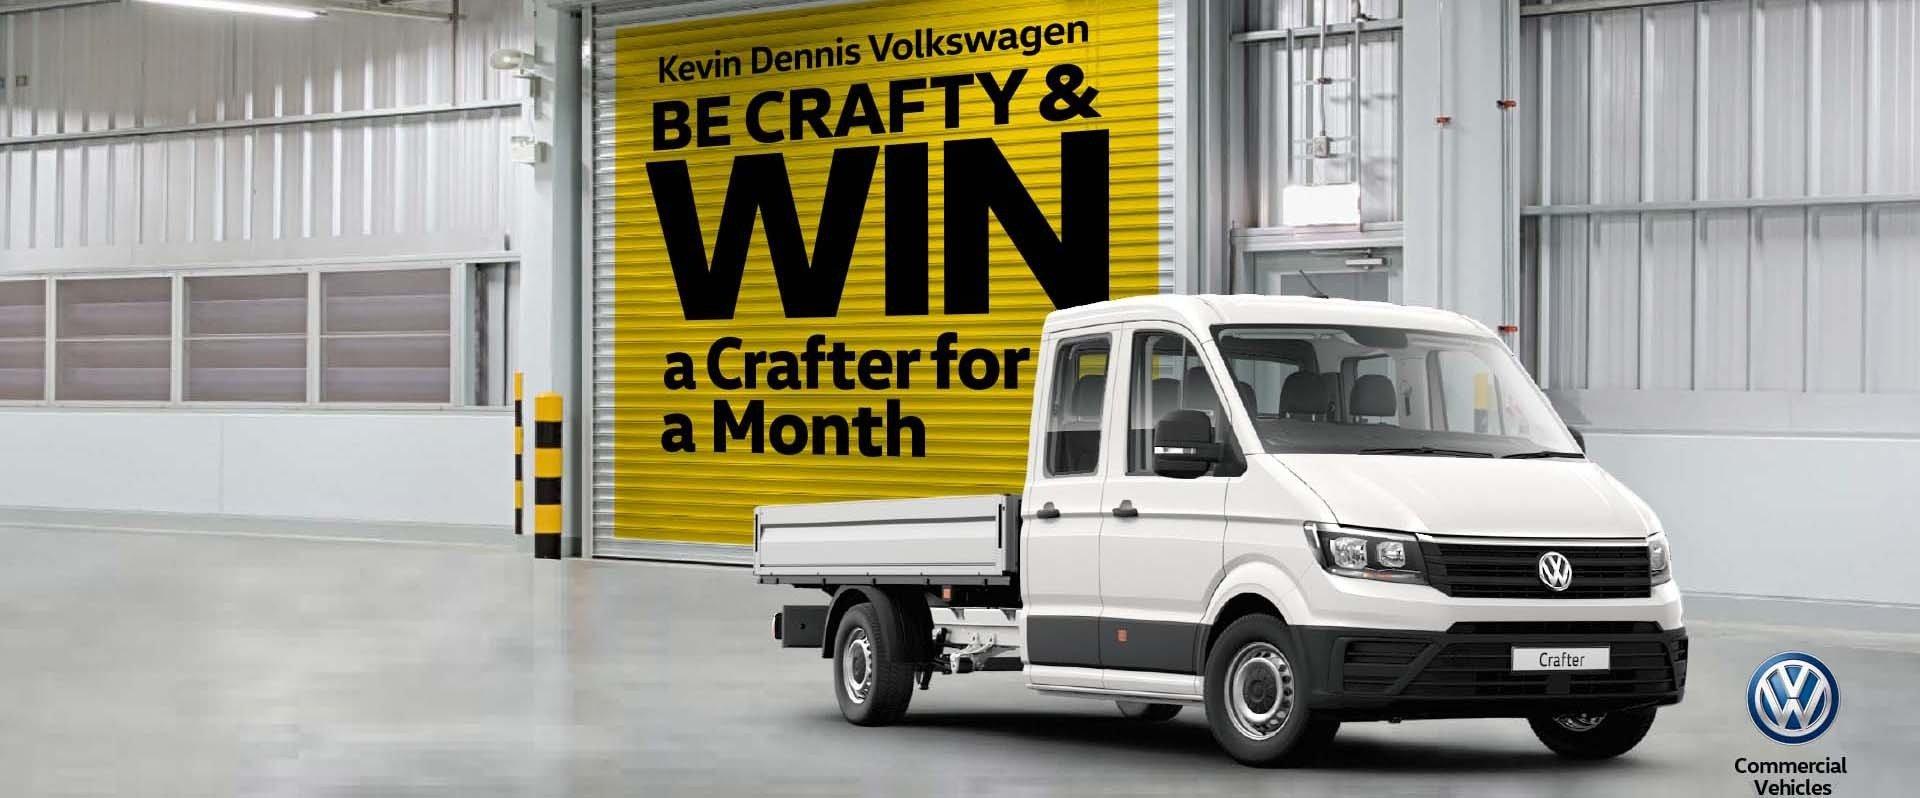 Kevin Dennis VW Be Crafty